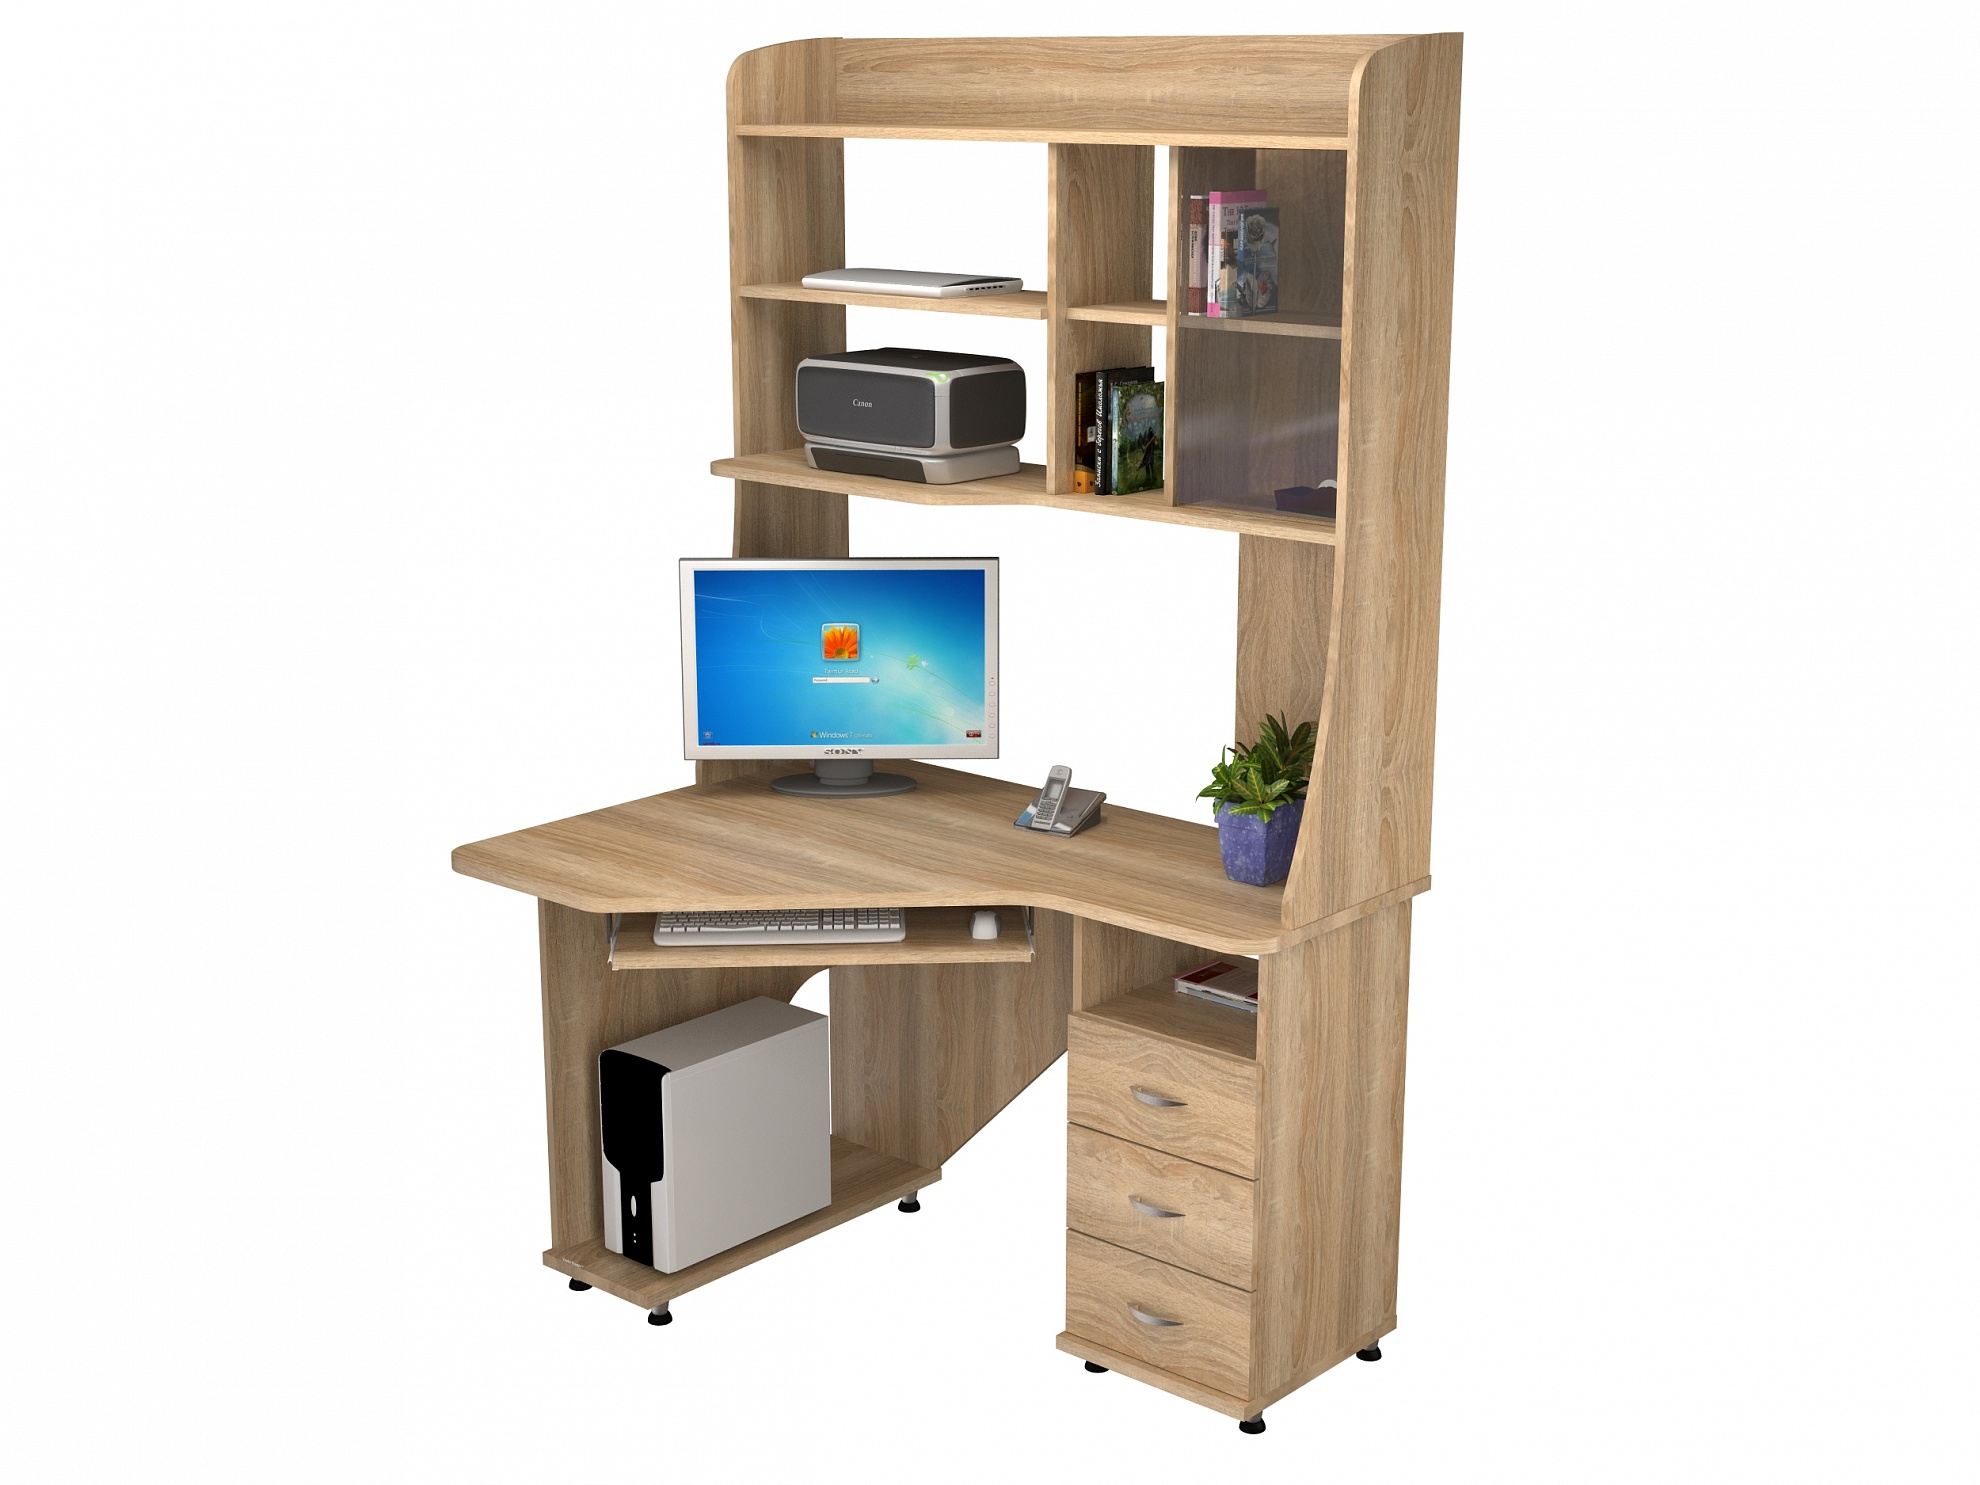 Компьютерный стол КС 20-29 компьютерный стол кс 20 16м3